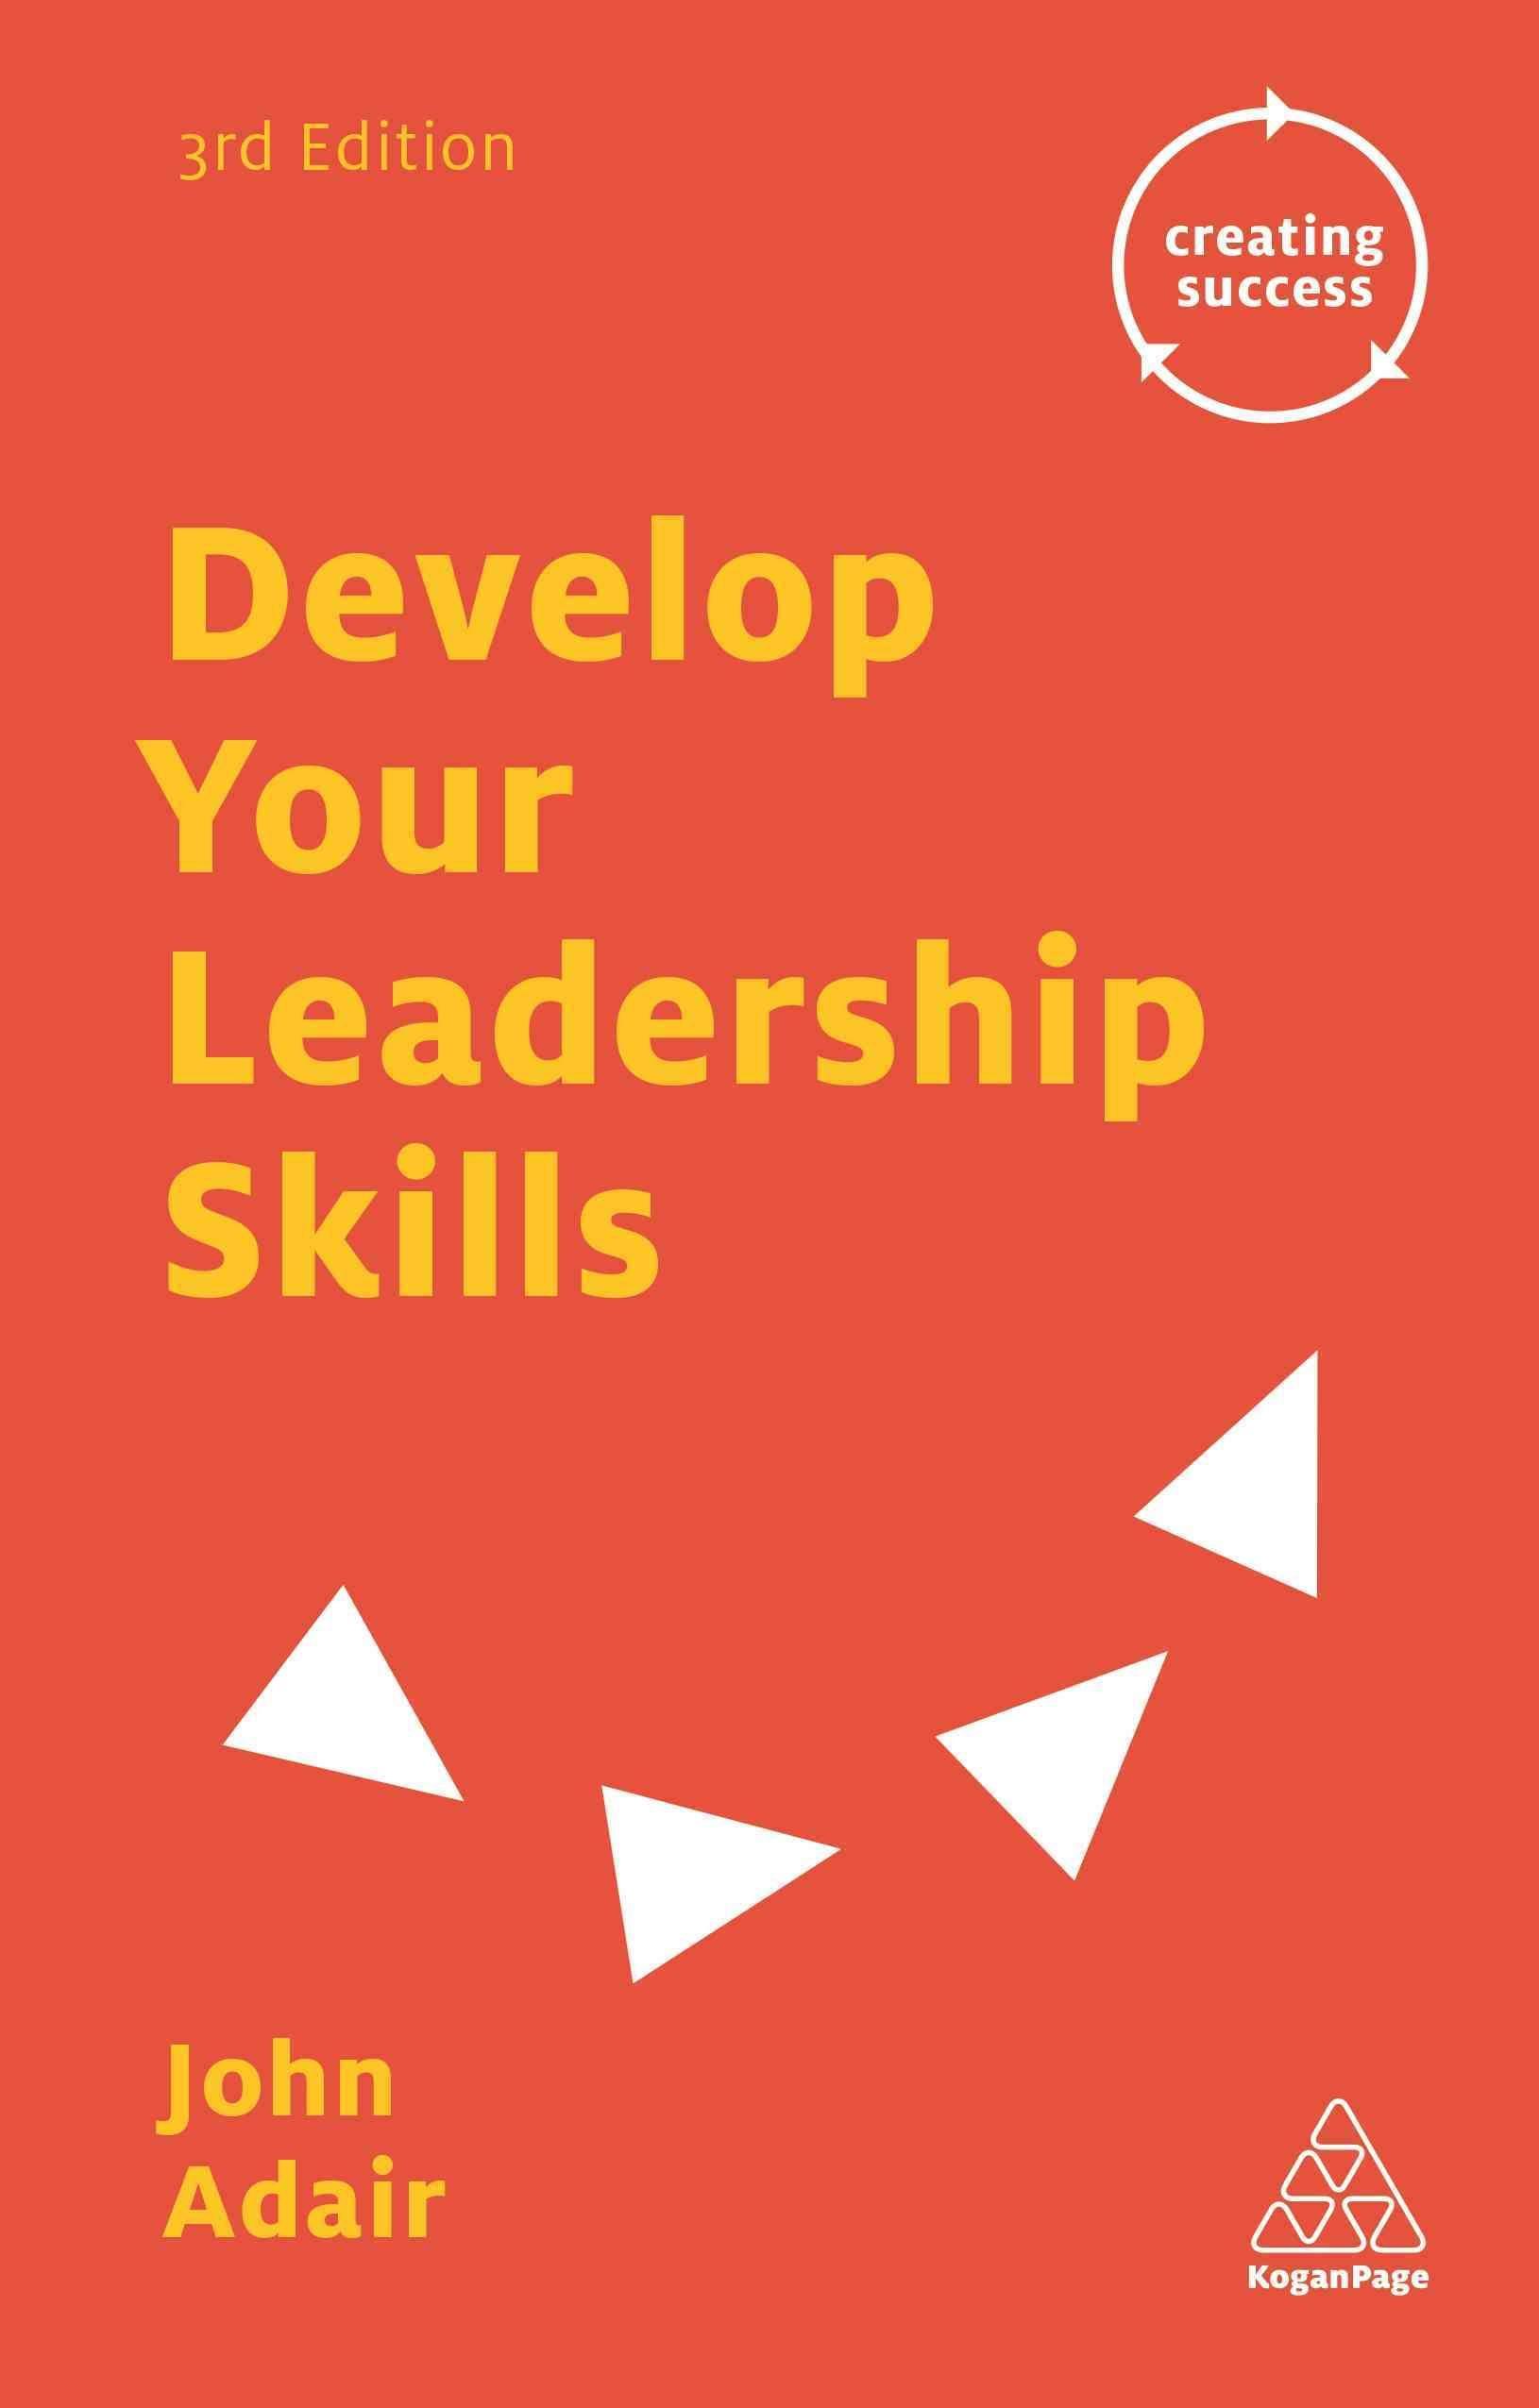 Develop Your Leadership Skills is John Adair's most